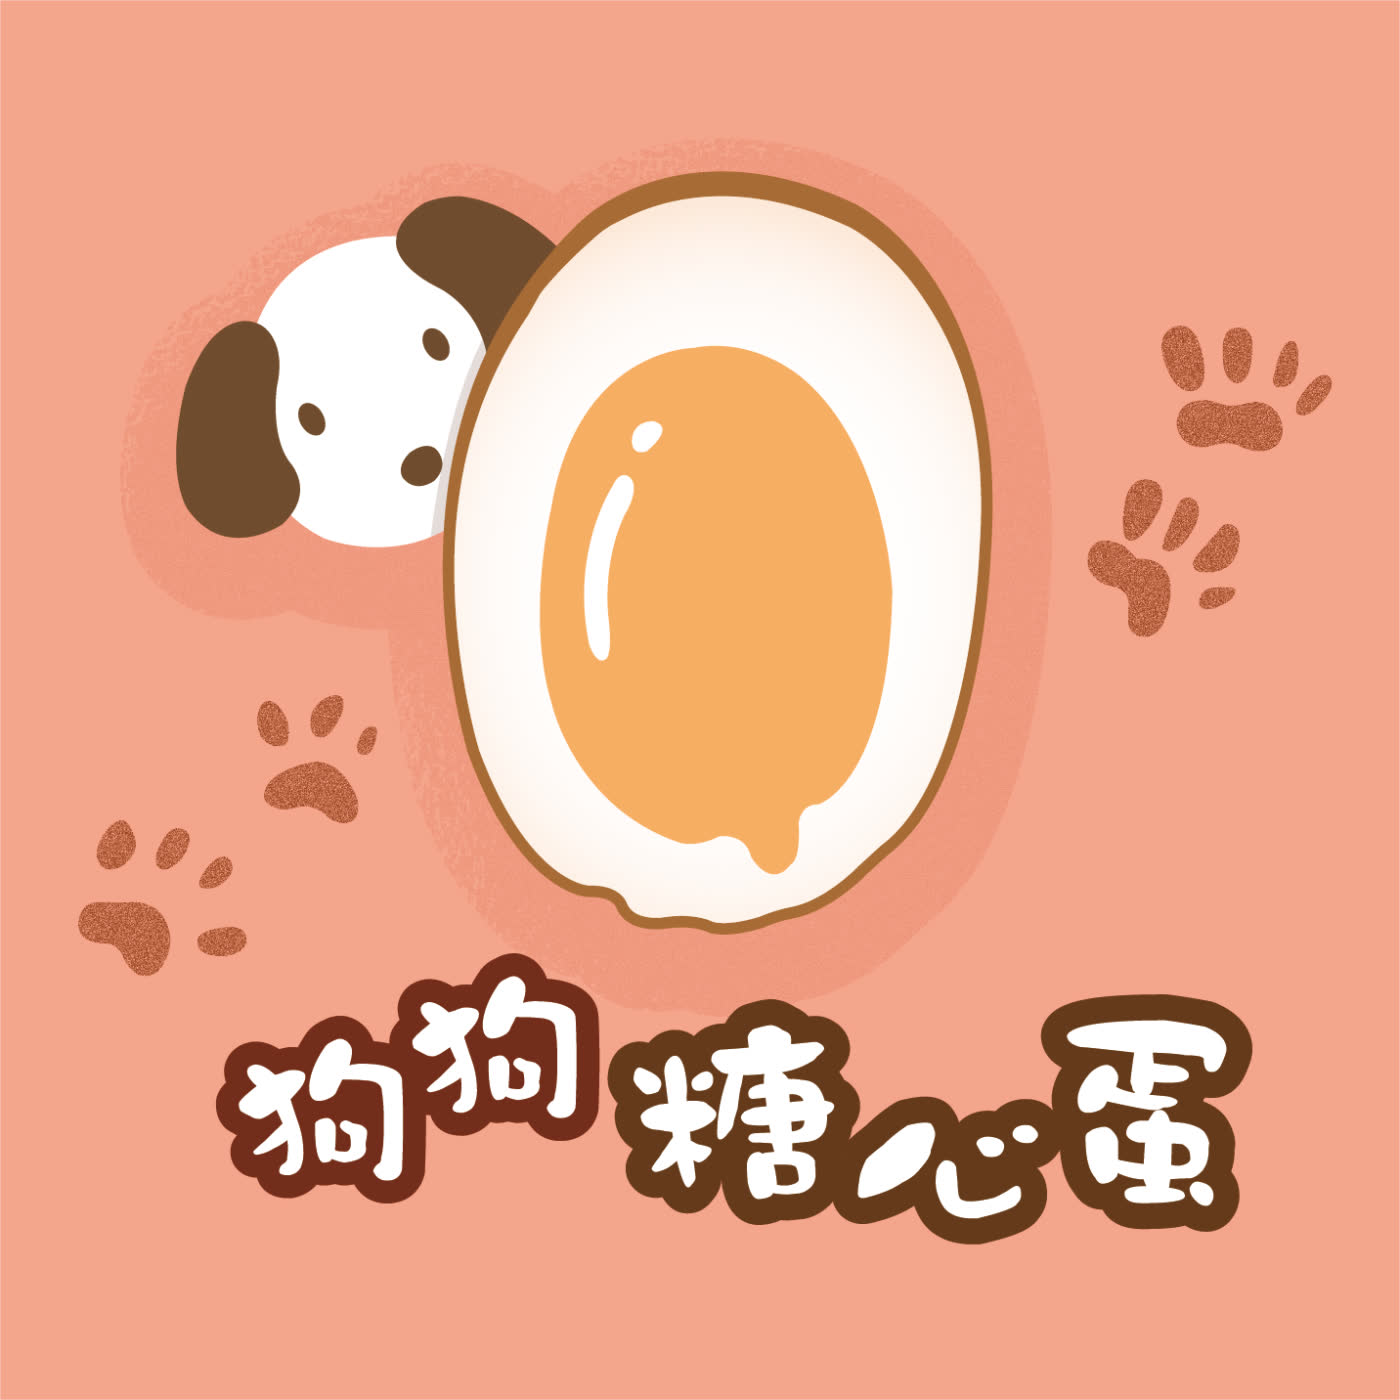 Ep. 0 狗狗糖心蛋 誕生啦!